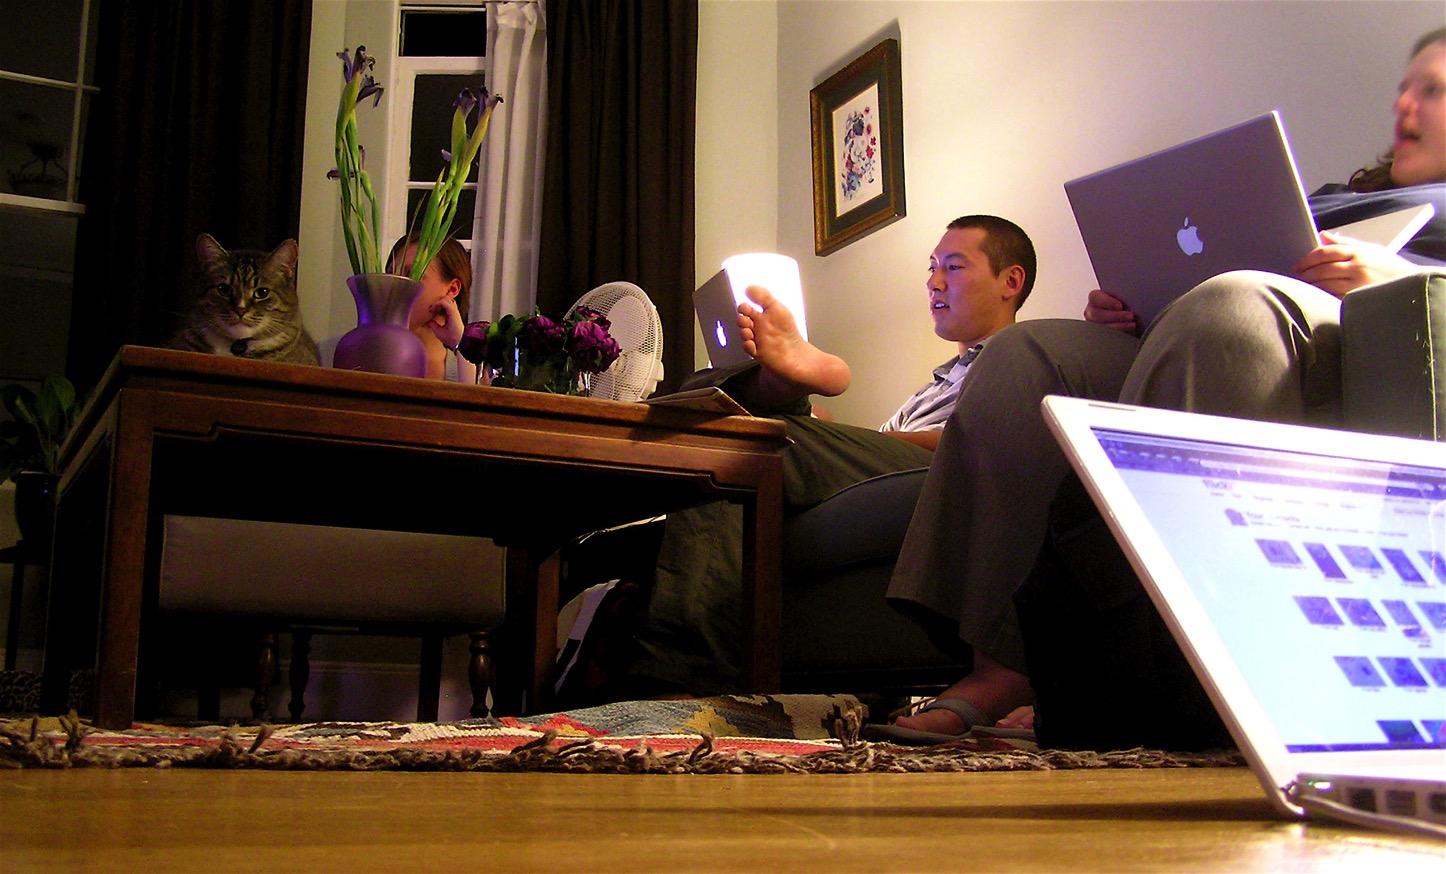 Mac in living room